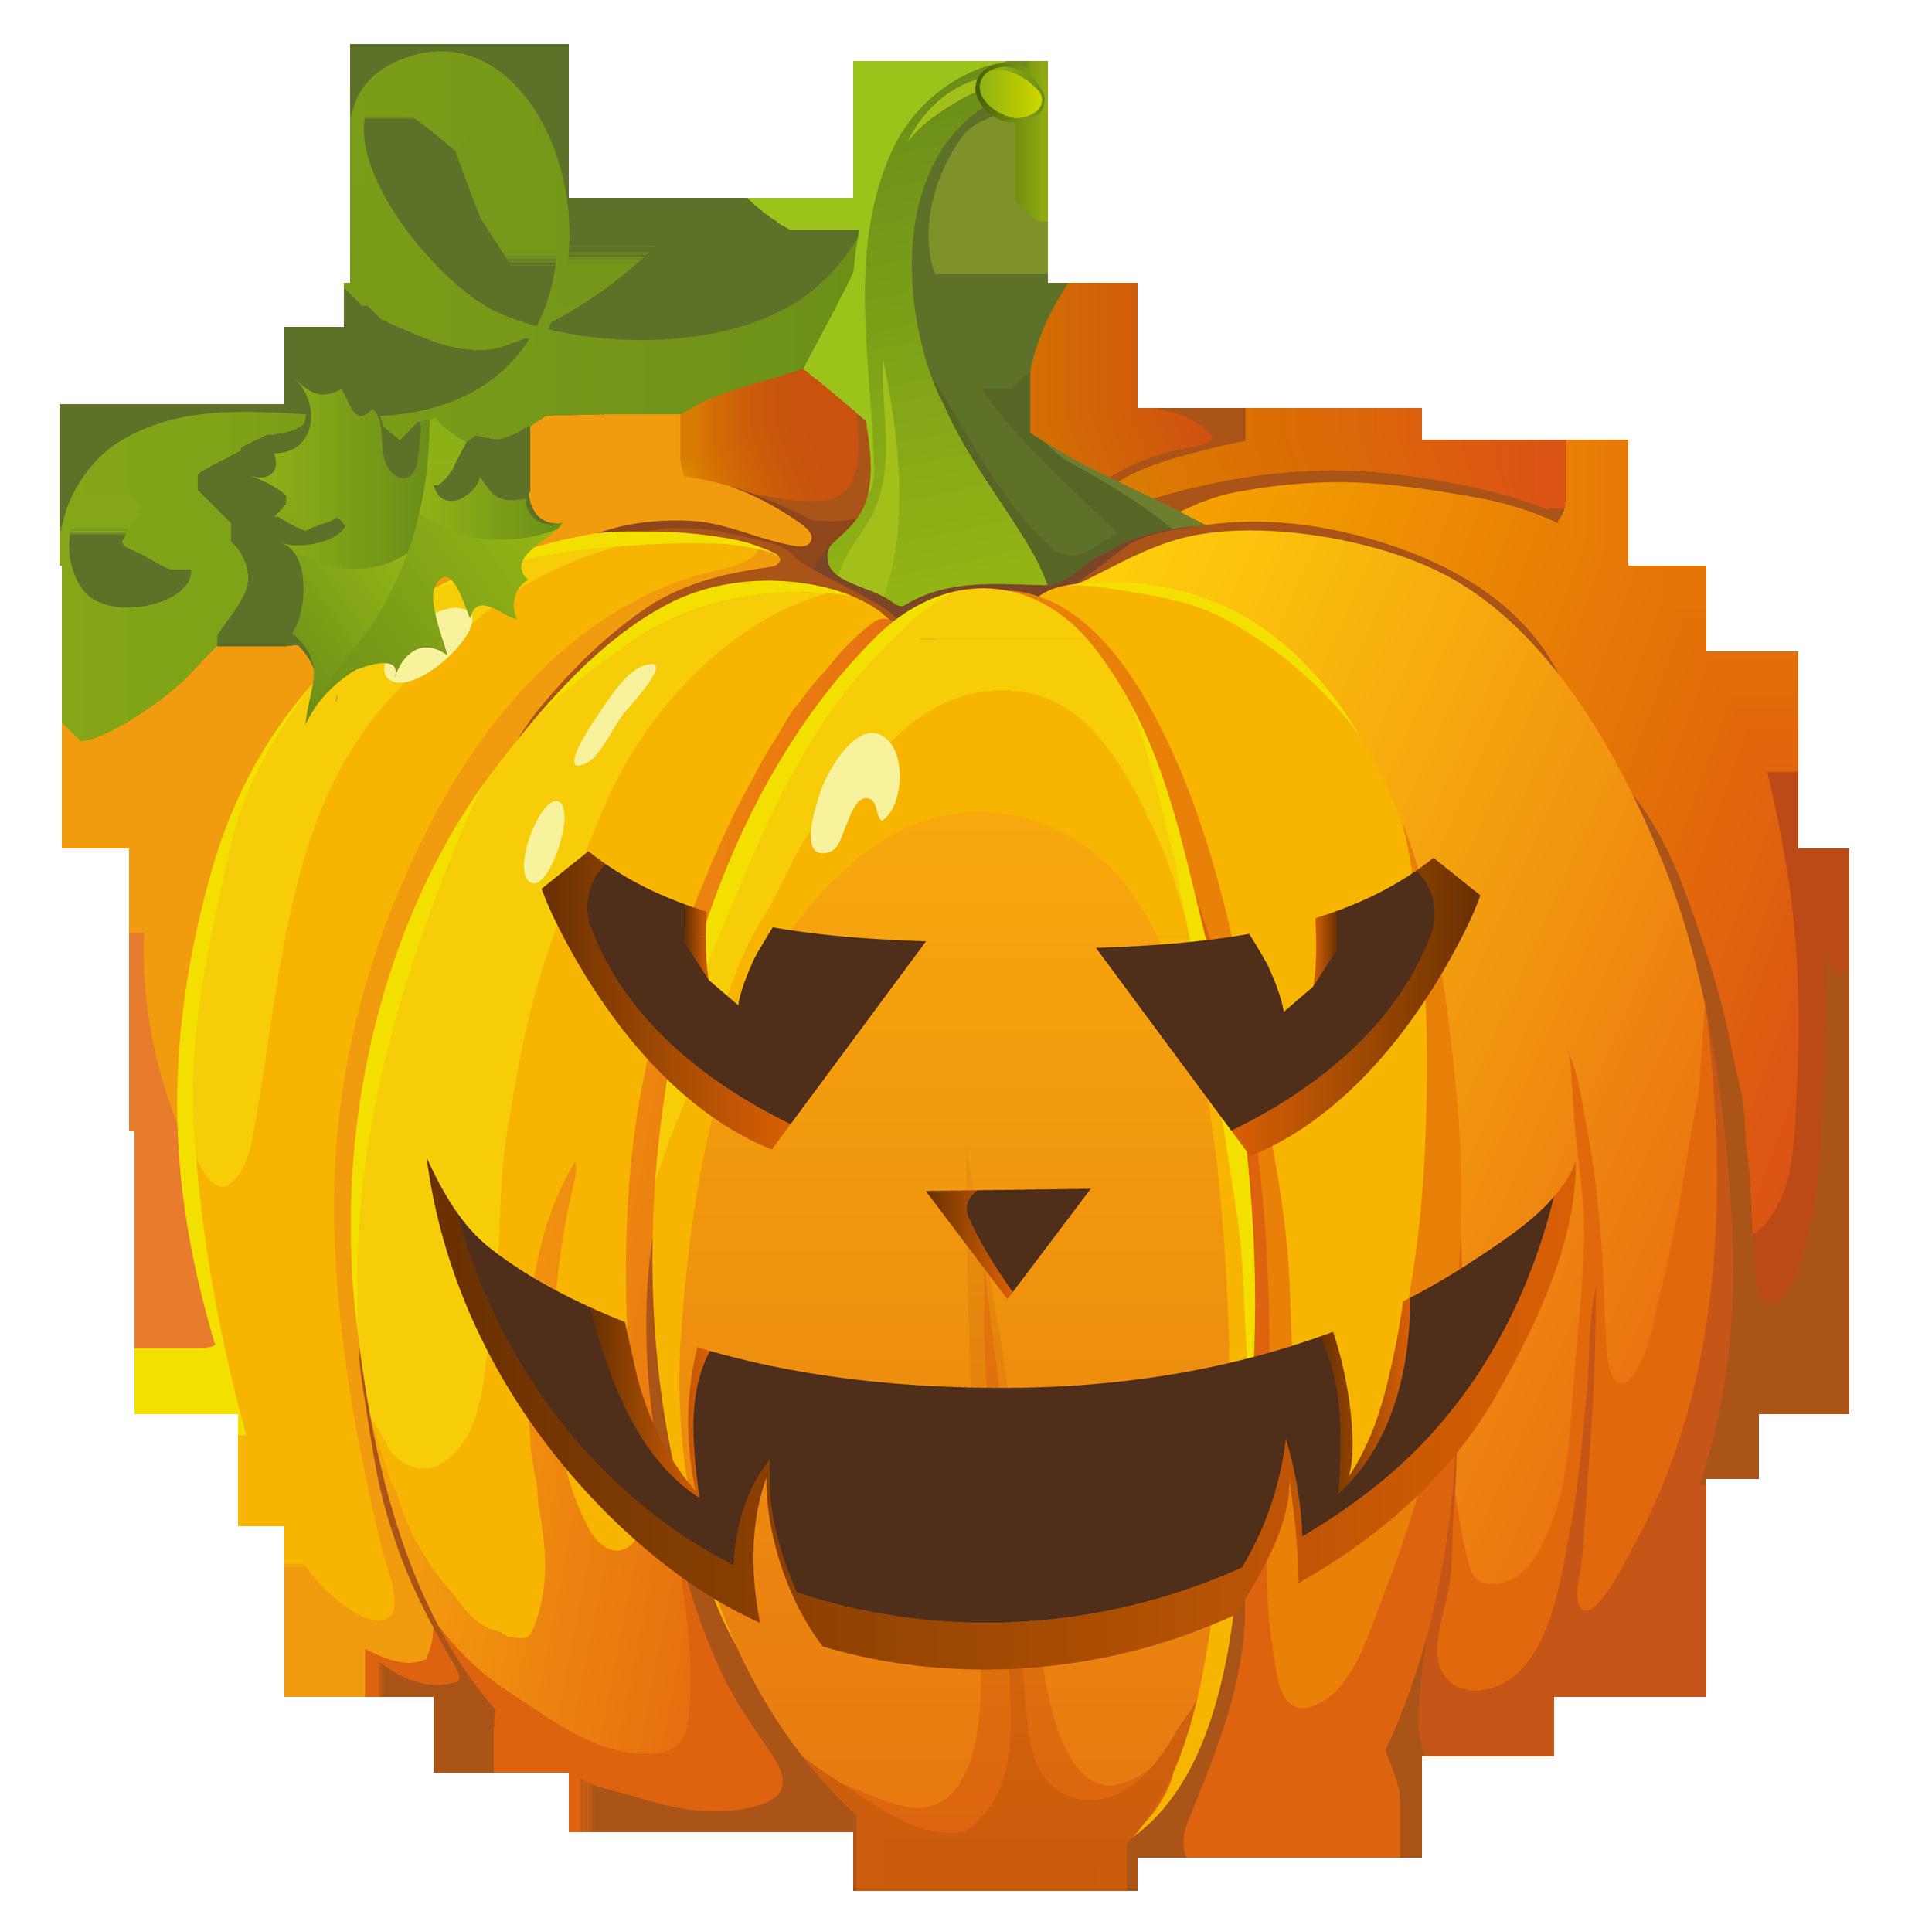 2500x2486 Cute Pumpkin Clip Art Free Clipart Images 2